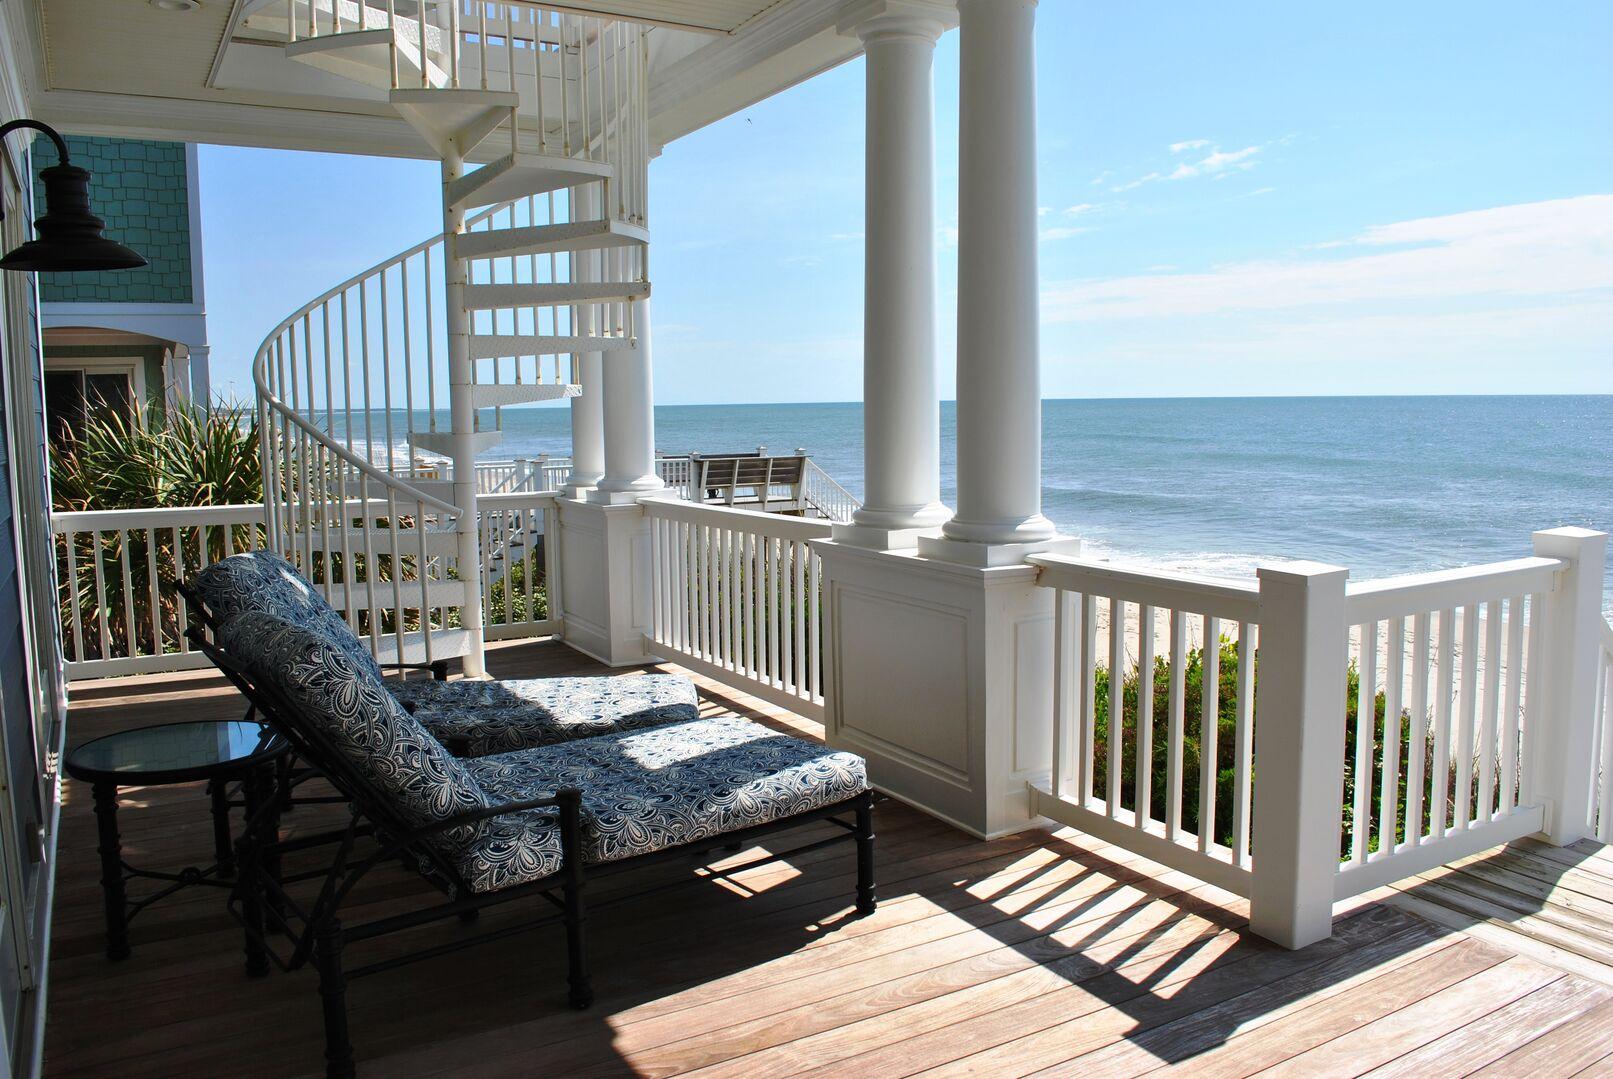 Oceanfront Porch - First Floor